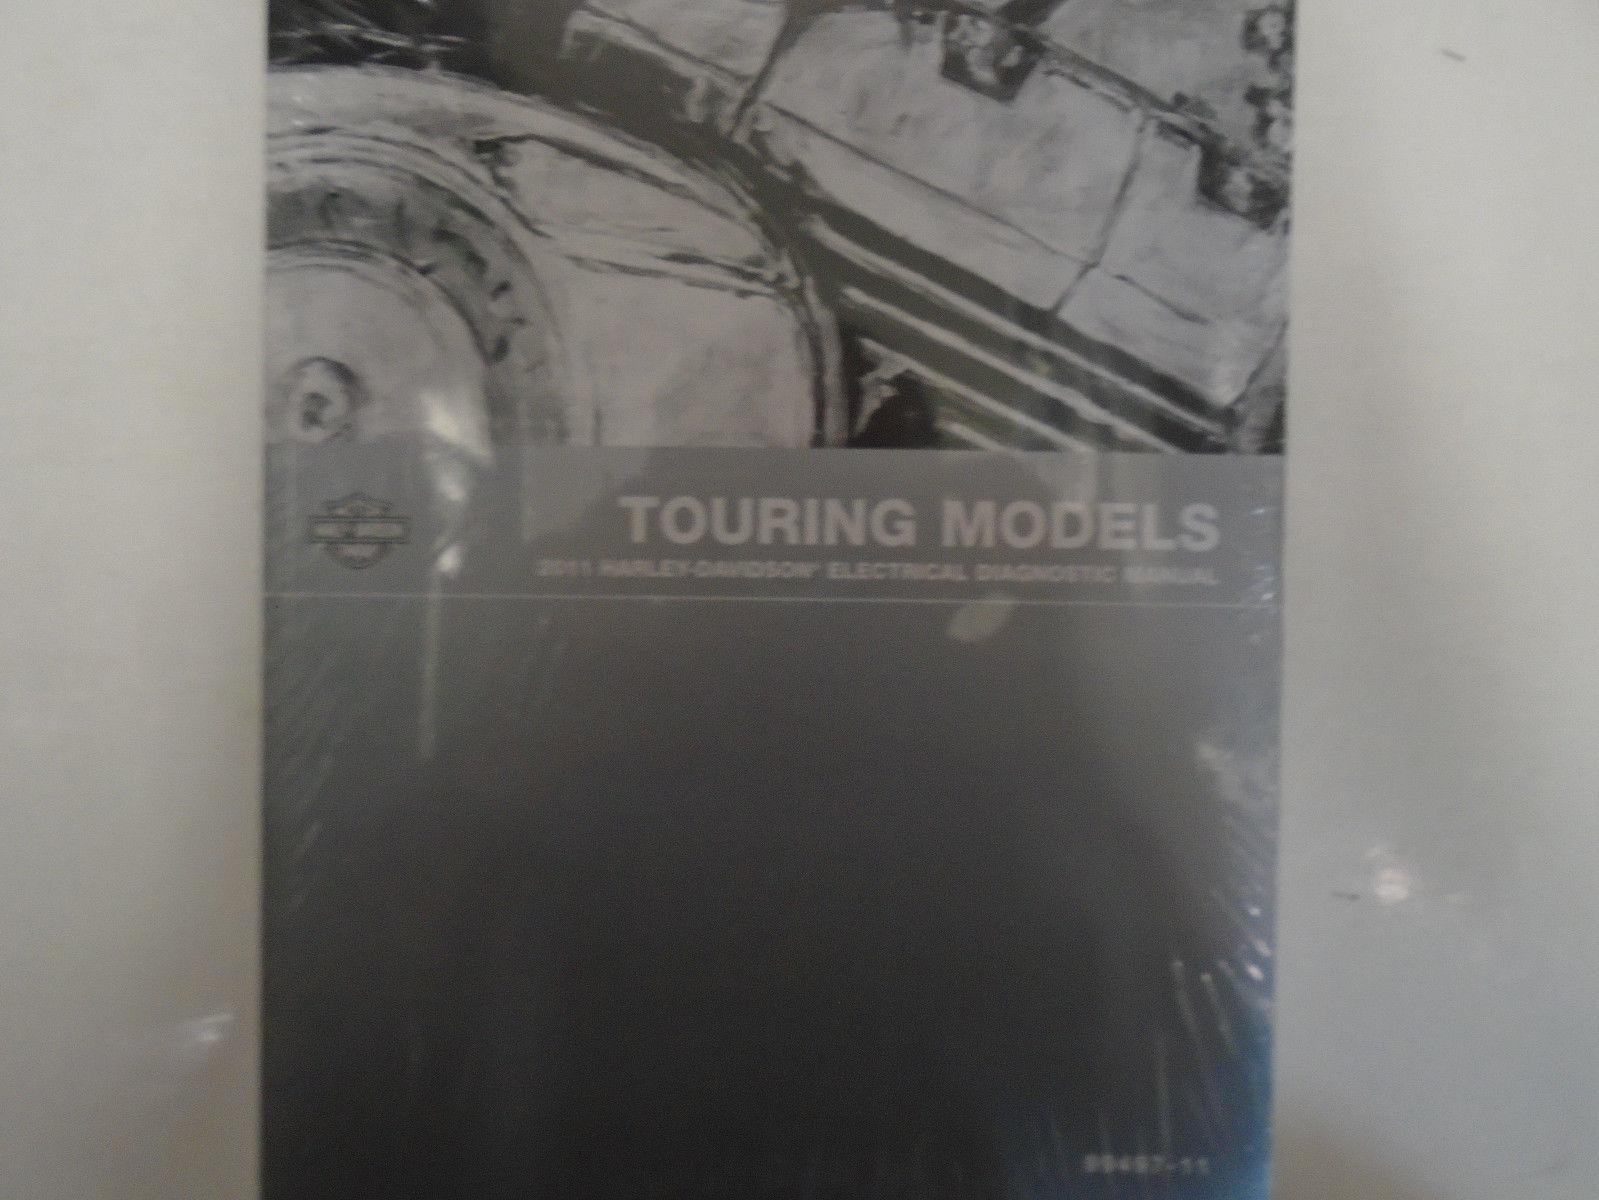 2011 Harley Davidson TOURING MODELS Electrical Diagnostic Manual Brand New  2011